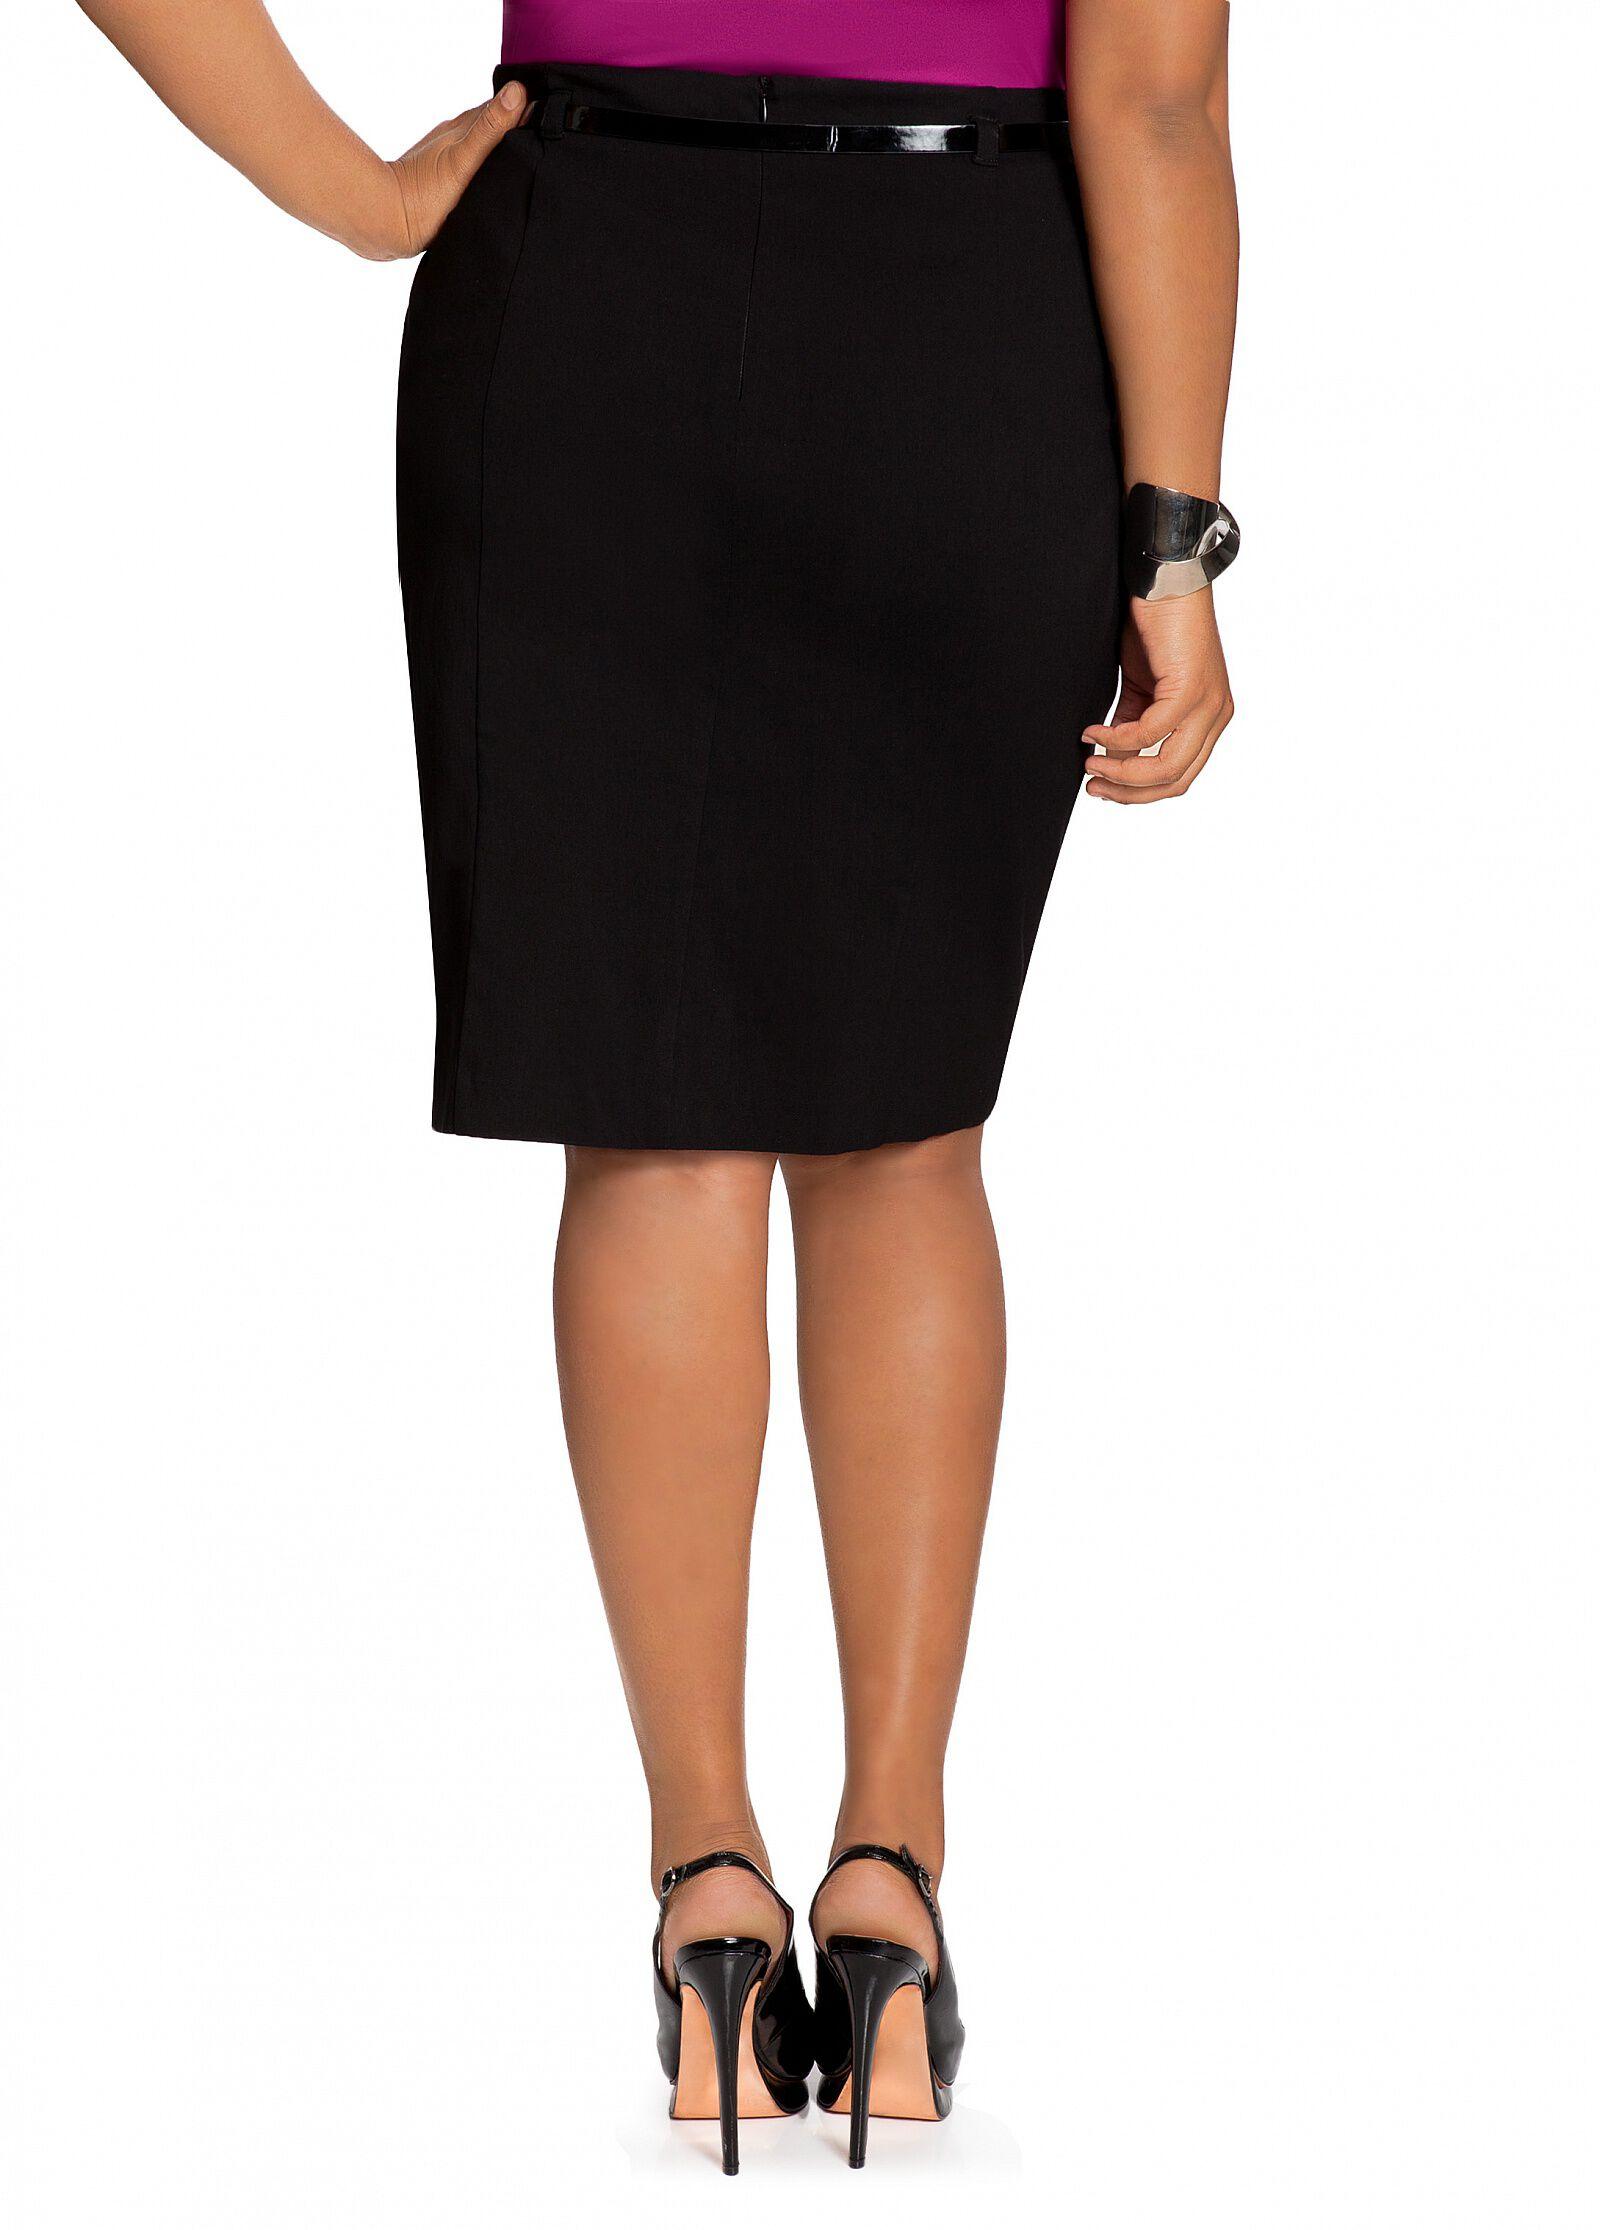 Millennium Pencil Skirt